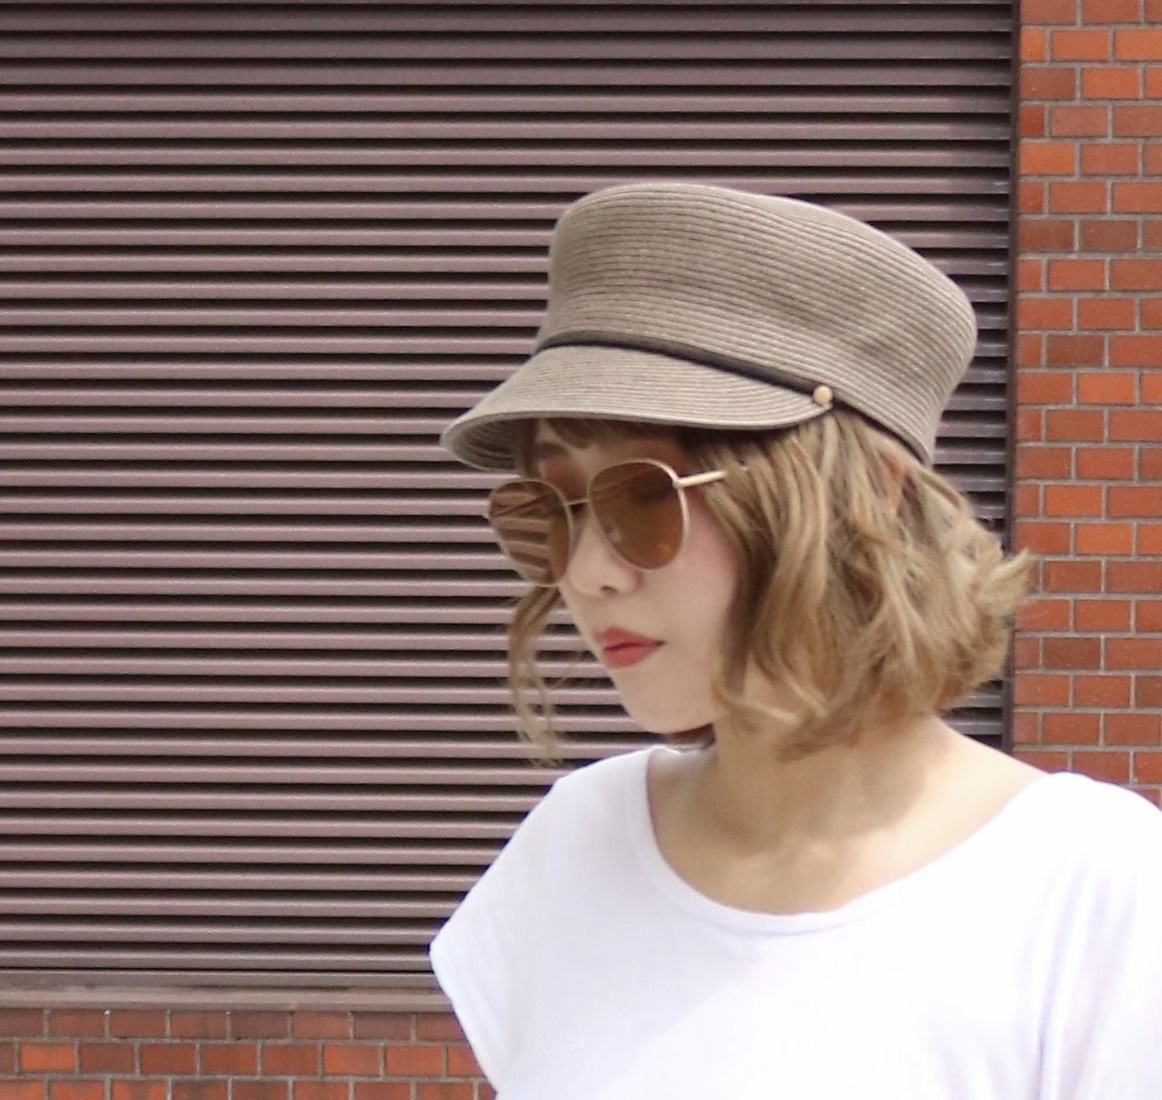 Scrap Book スクラップブック マリンキャップ ペーパー素材 コード付きマリンキャップ 日本ブランド 母の日ギフト 帽子 ハット